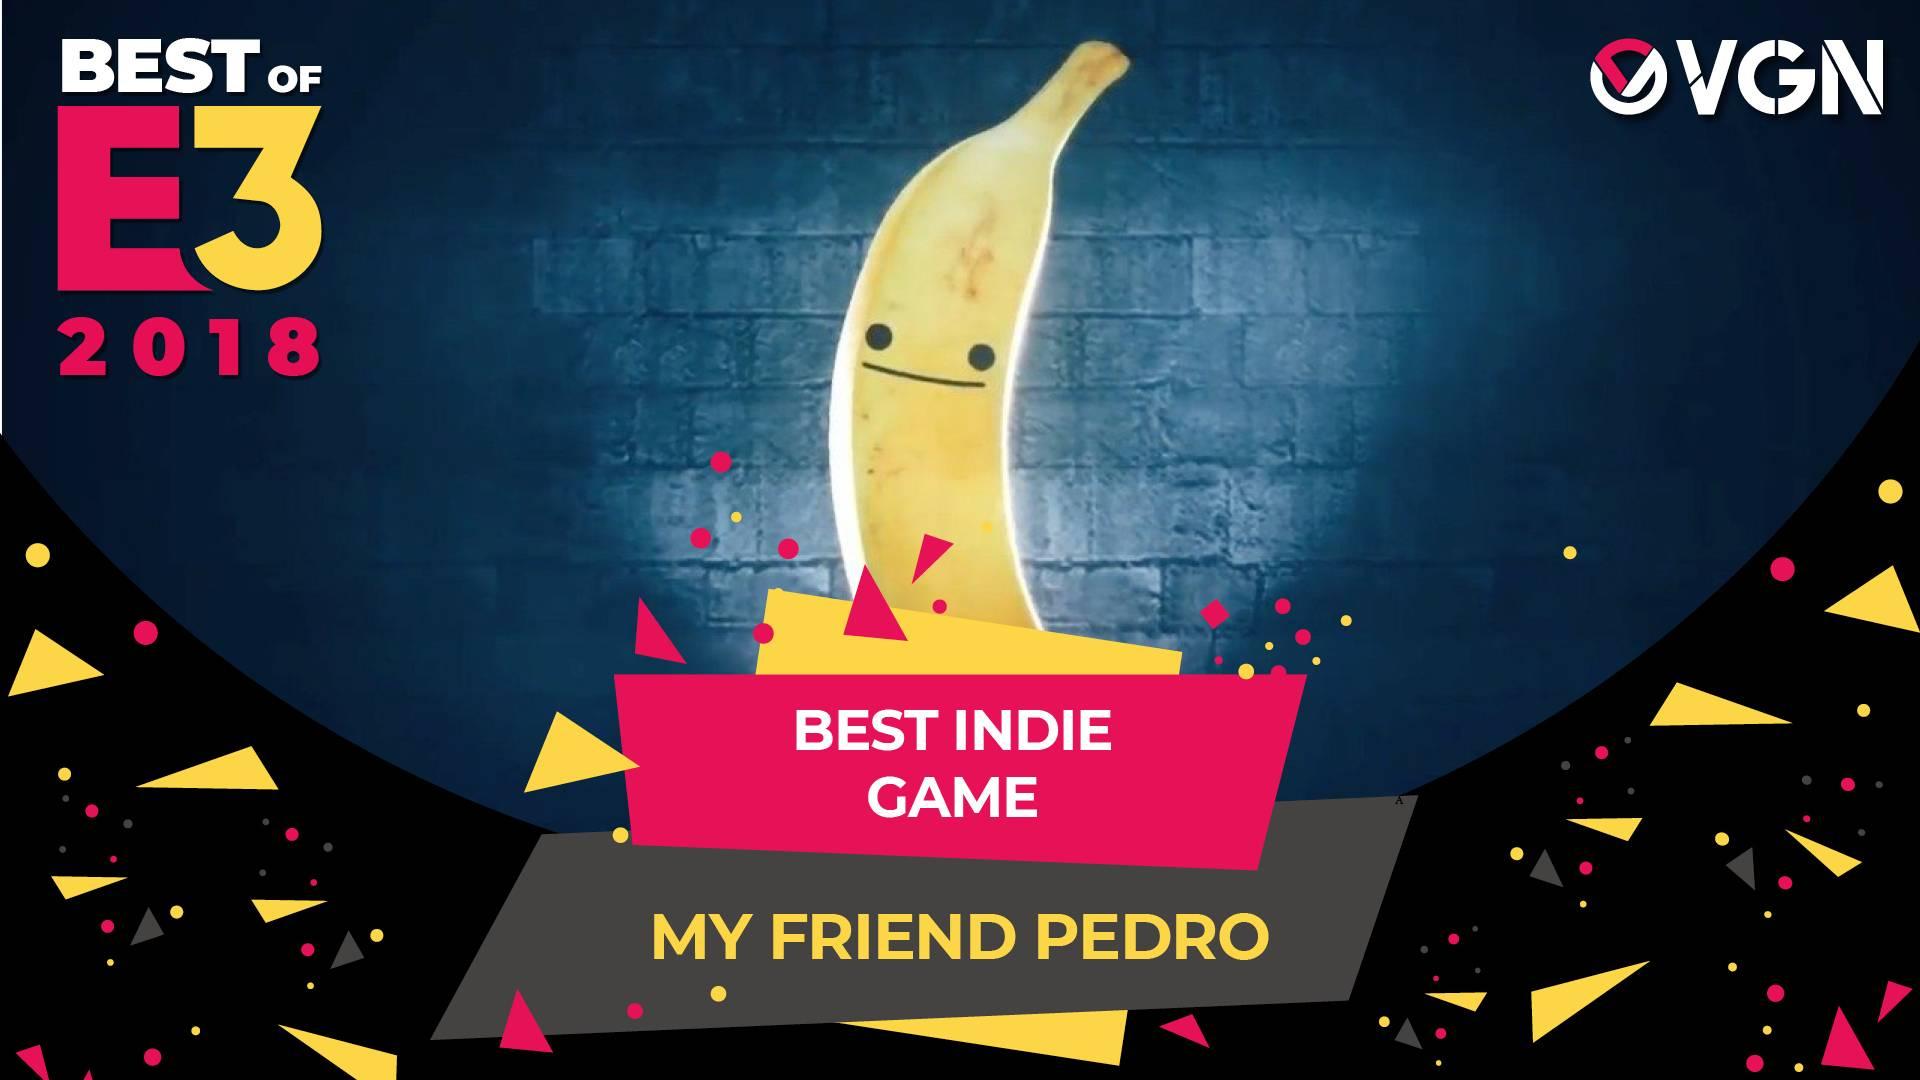 E3 2018 - Best Indie Game - My Friend Pedro